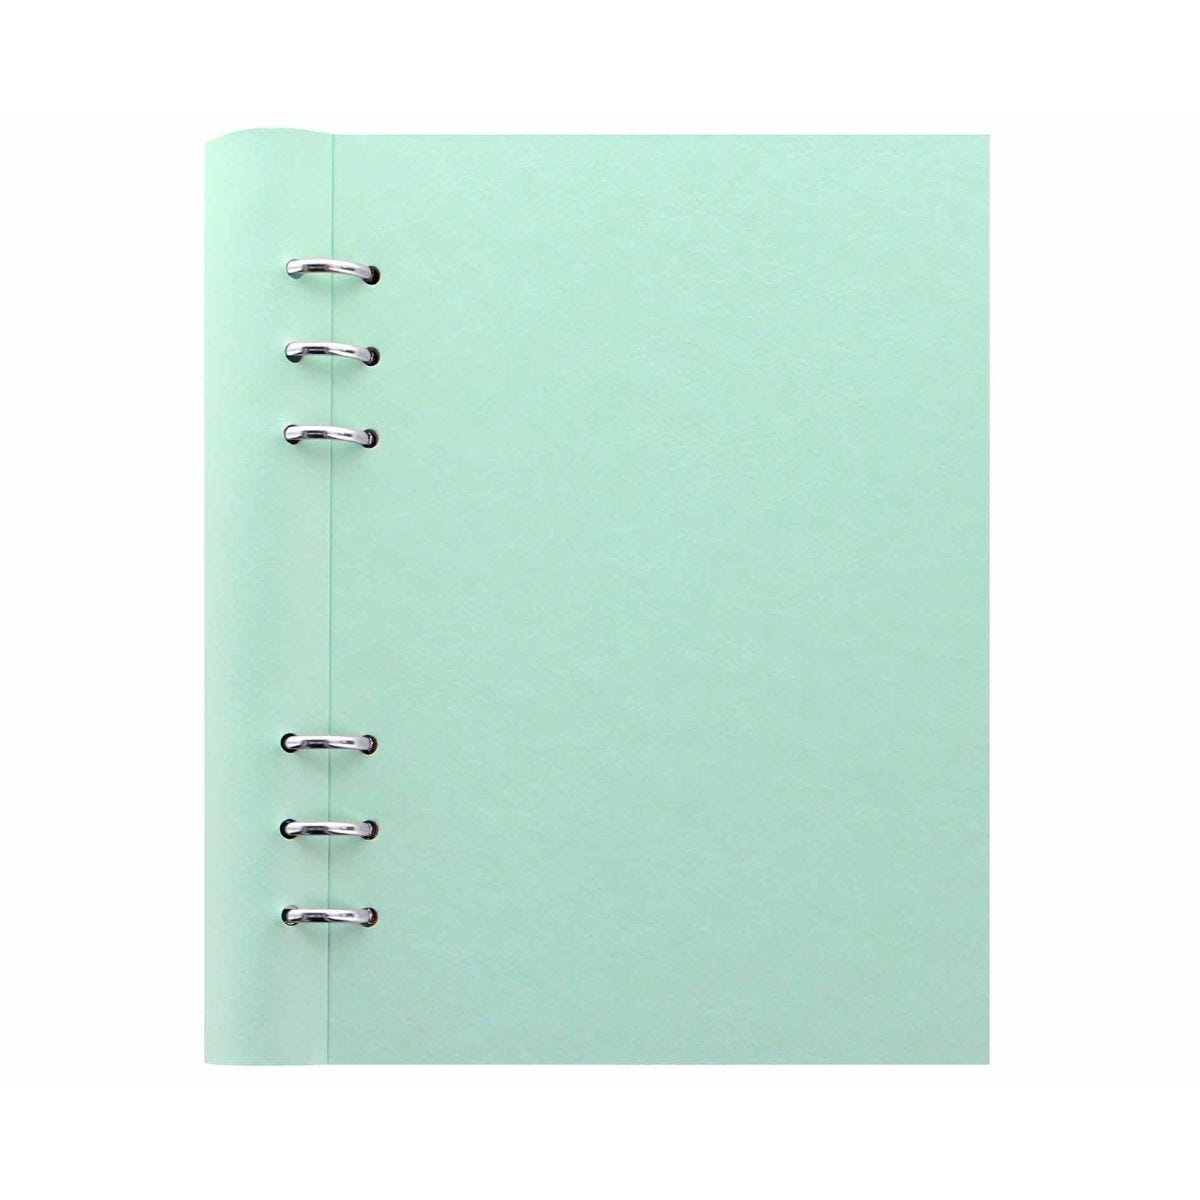 Filofax Refillable Clipbook Planner A5 Duck Egg